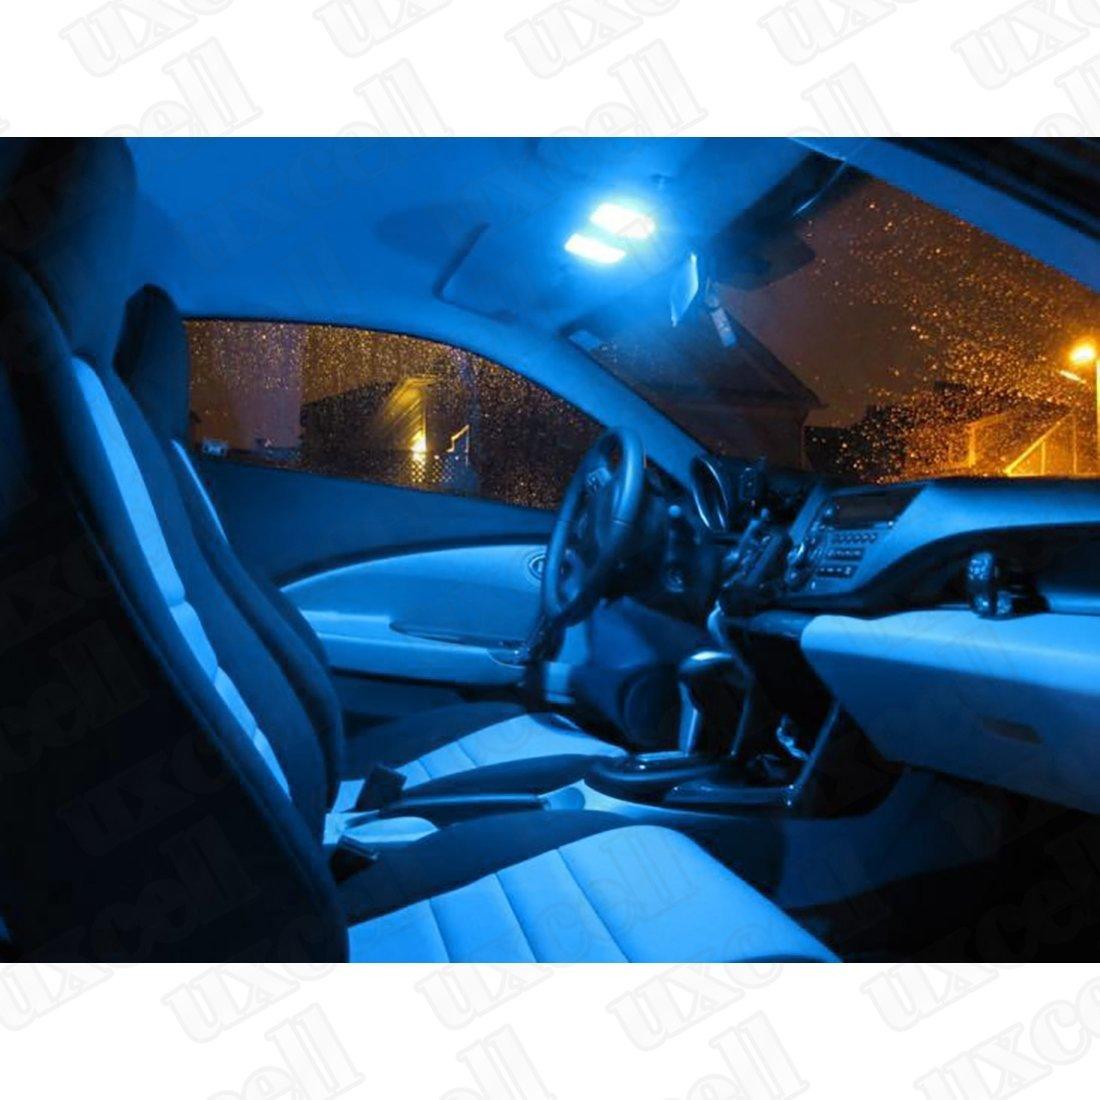 Amazon.com: eDealMax 8 x 31 mm 12-SMD 31mm bóveda del Adorno Bombilla de luz LED Azul DE3175 DE3022: Automotive